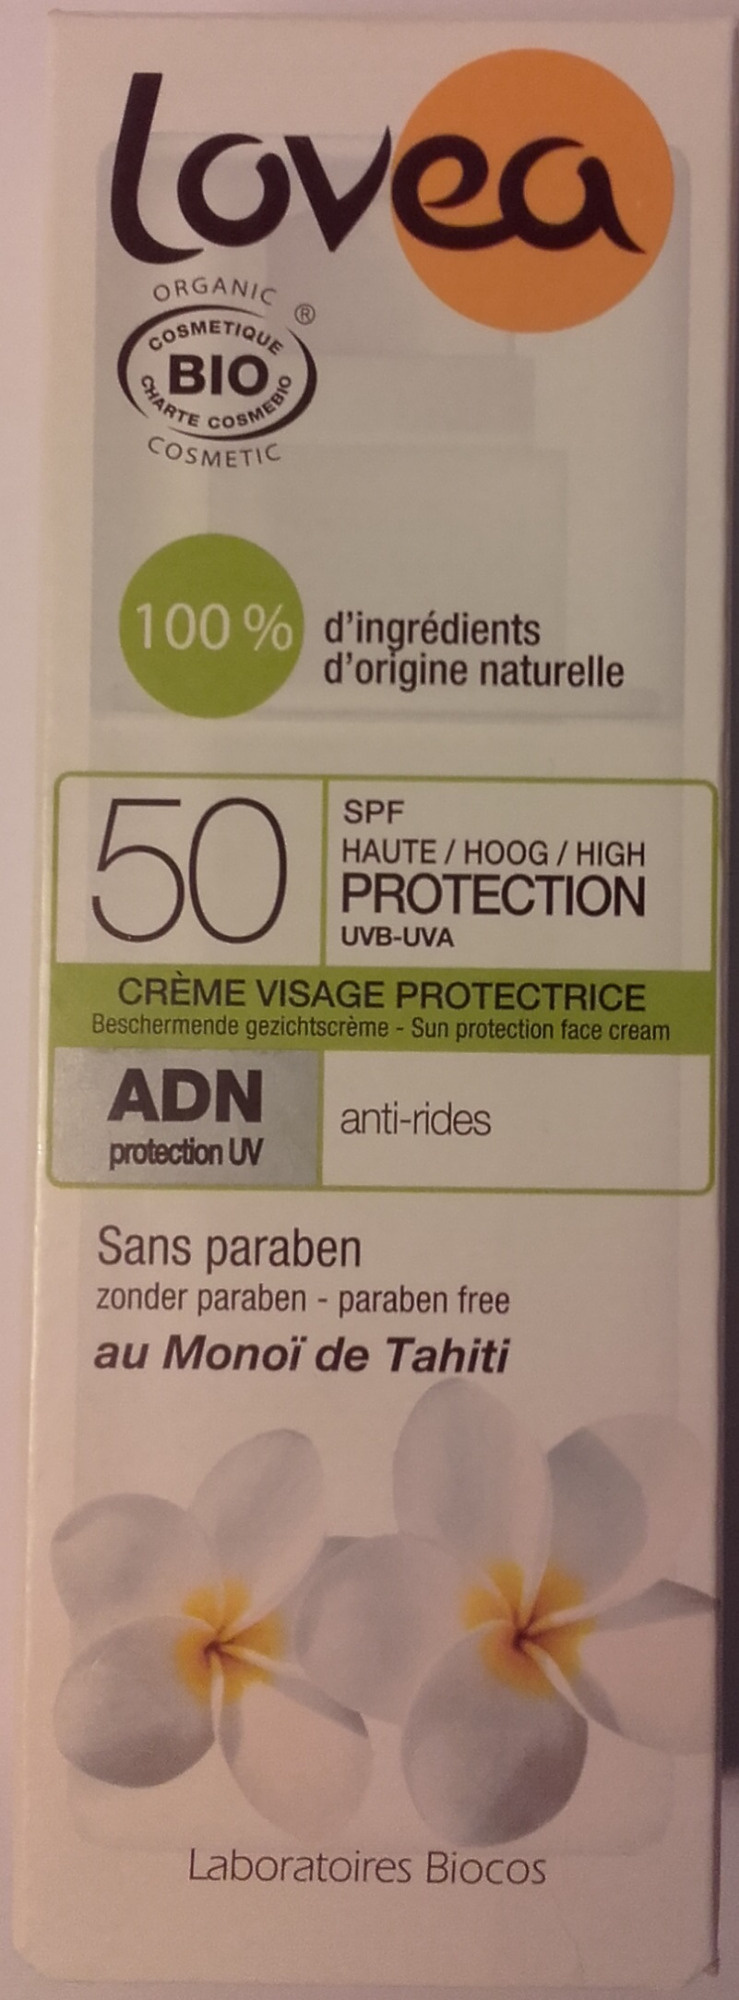 Crème visage protectrice SPF 50 anti-rides au Monoï de Tahiti - Product - fr